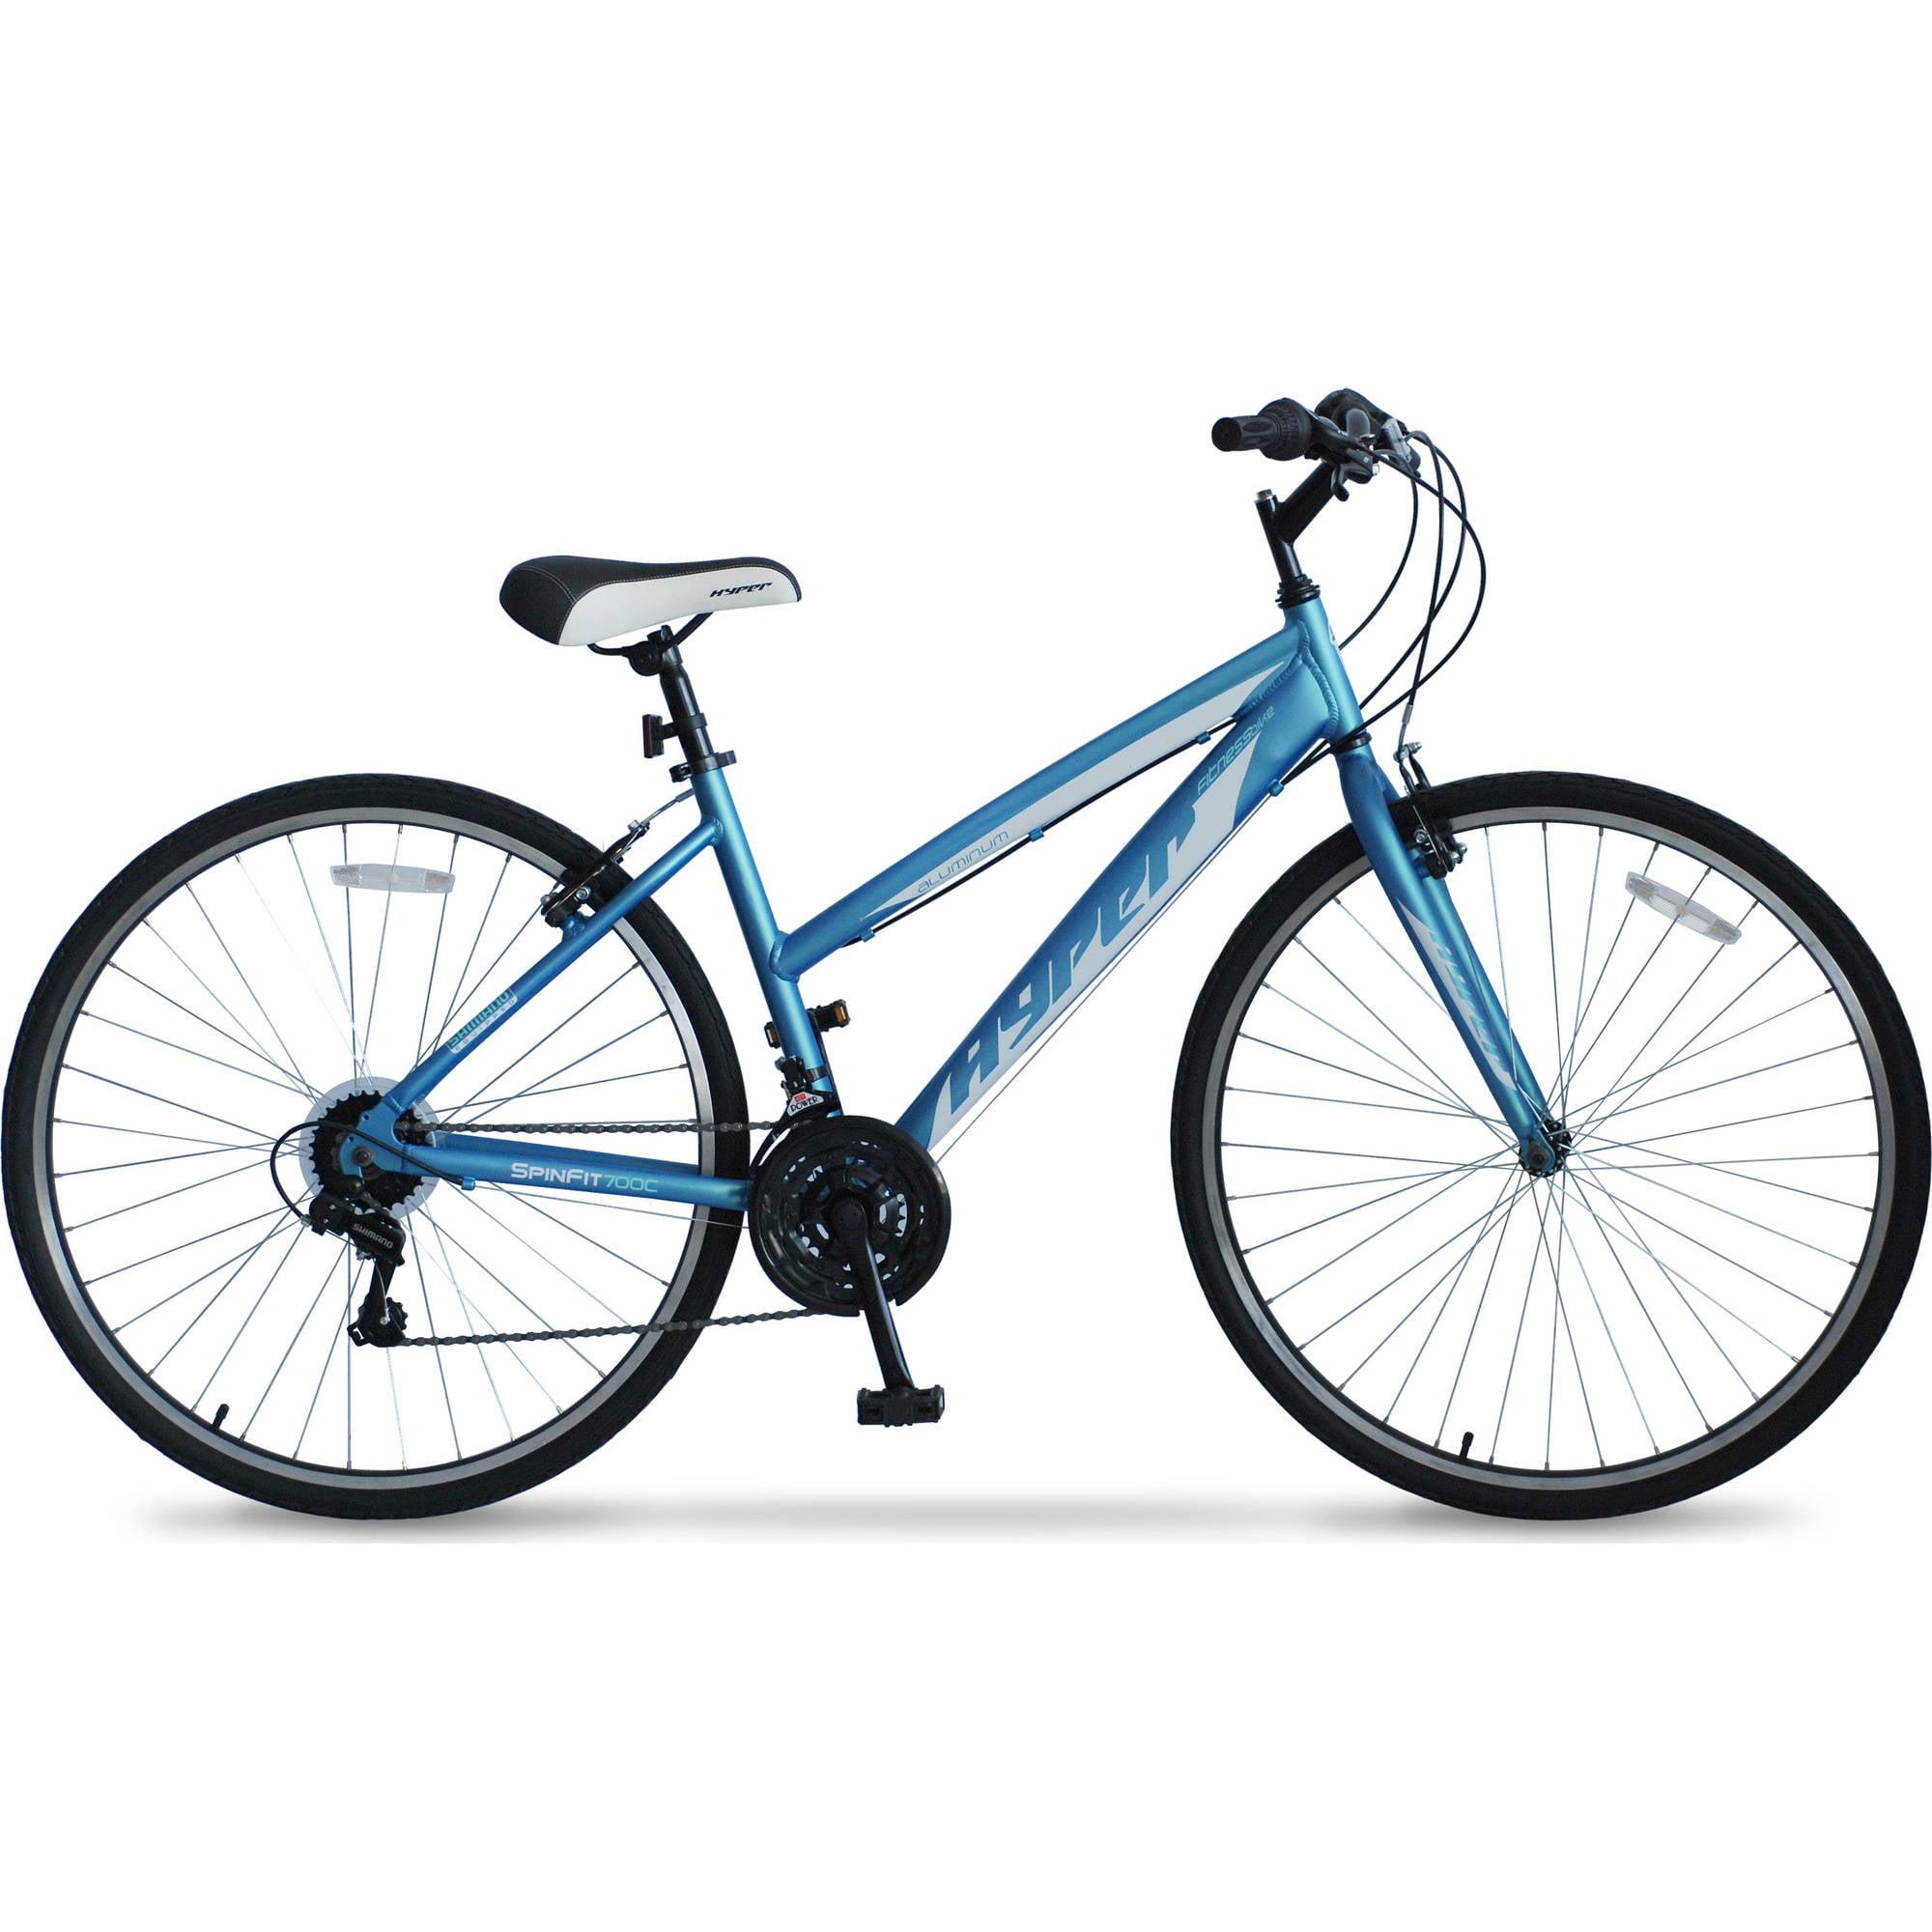 700c Hyper SpinFit Women's Fitness Bike by